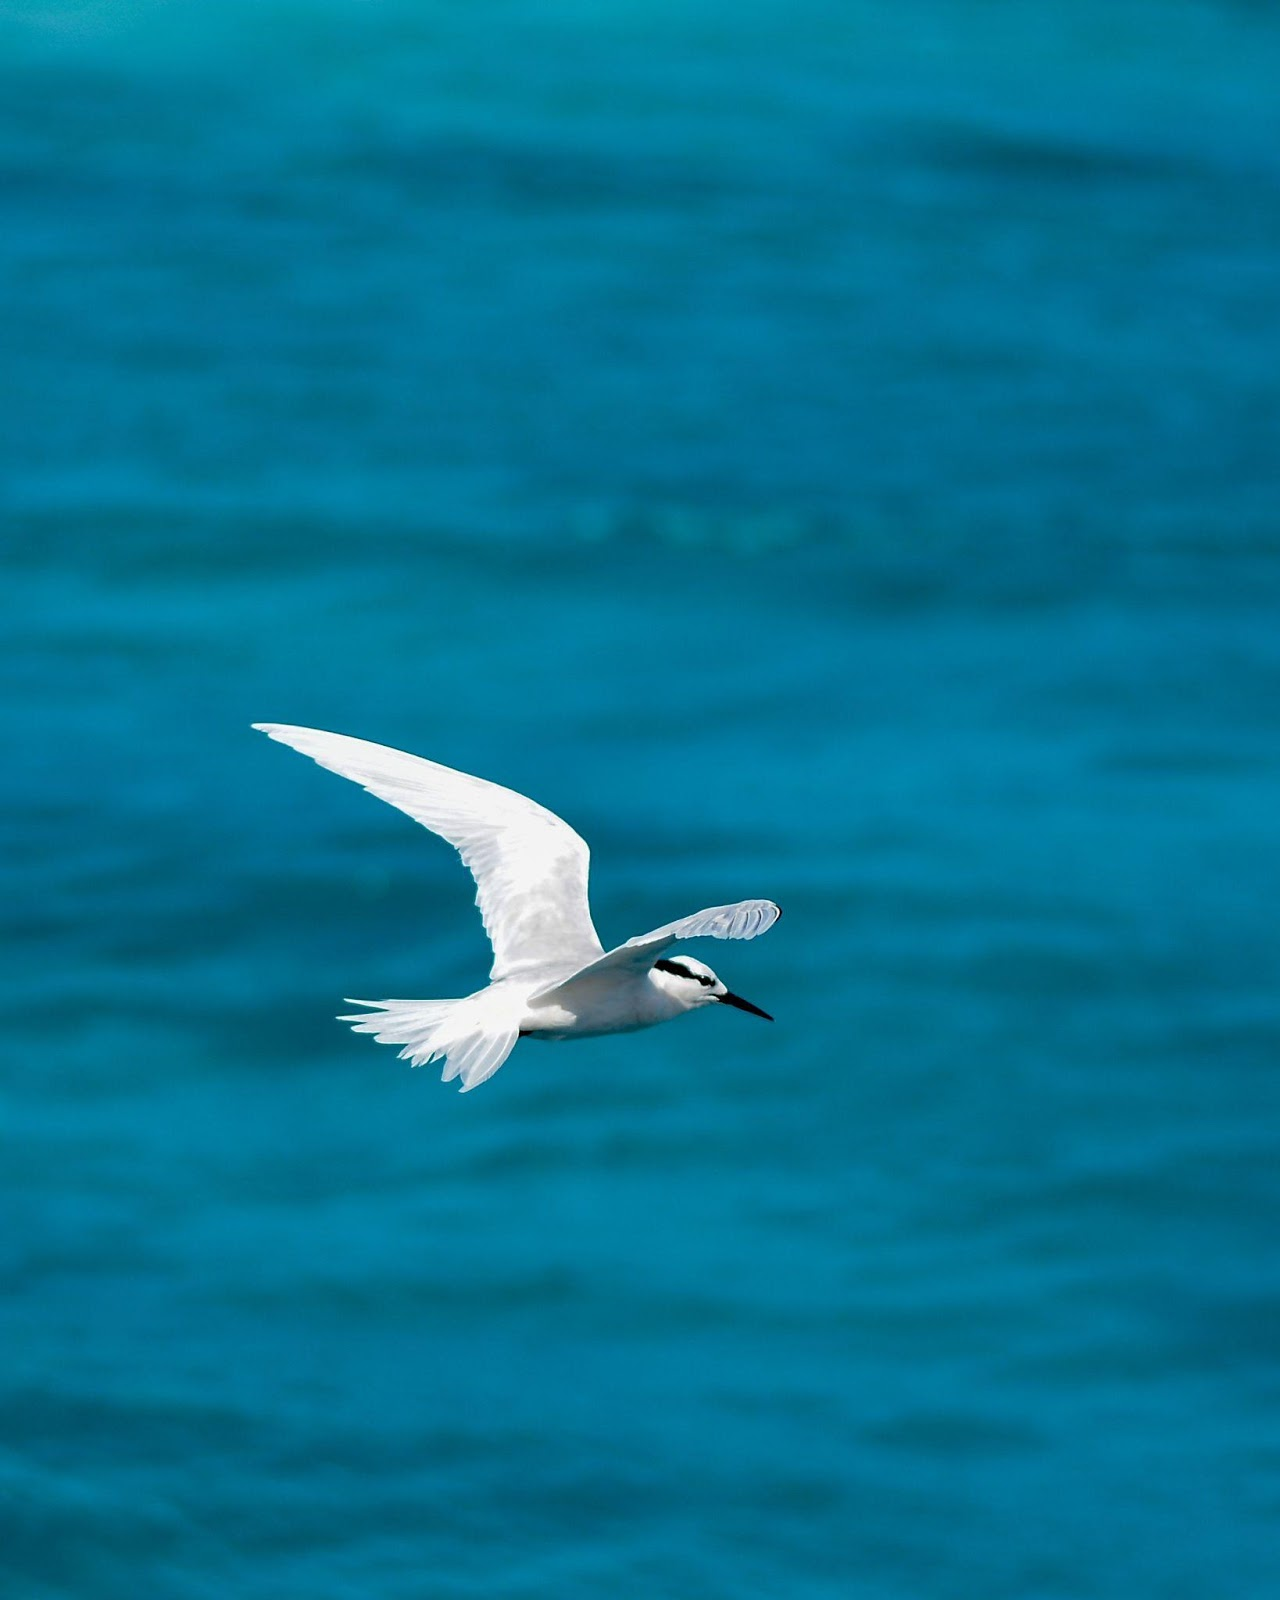 Arctic Tern flying over the ocean